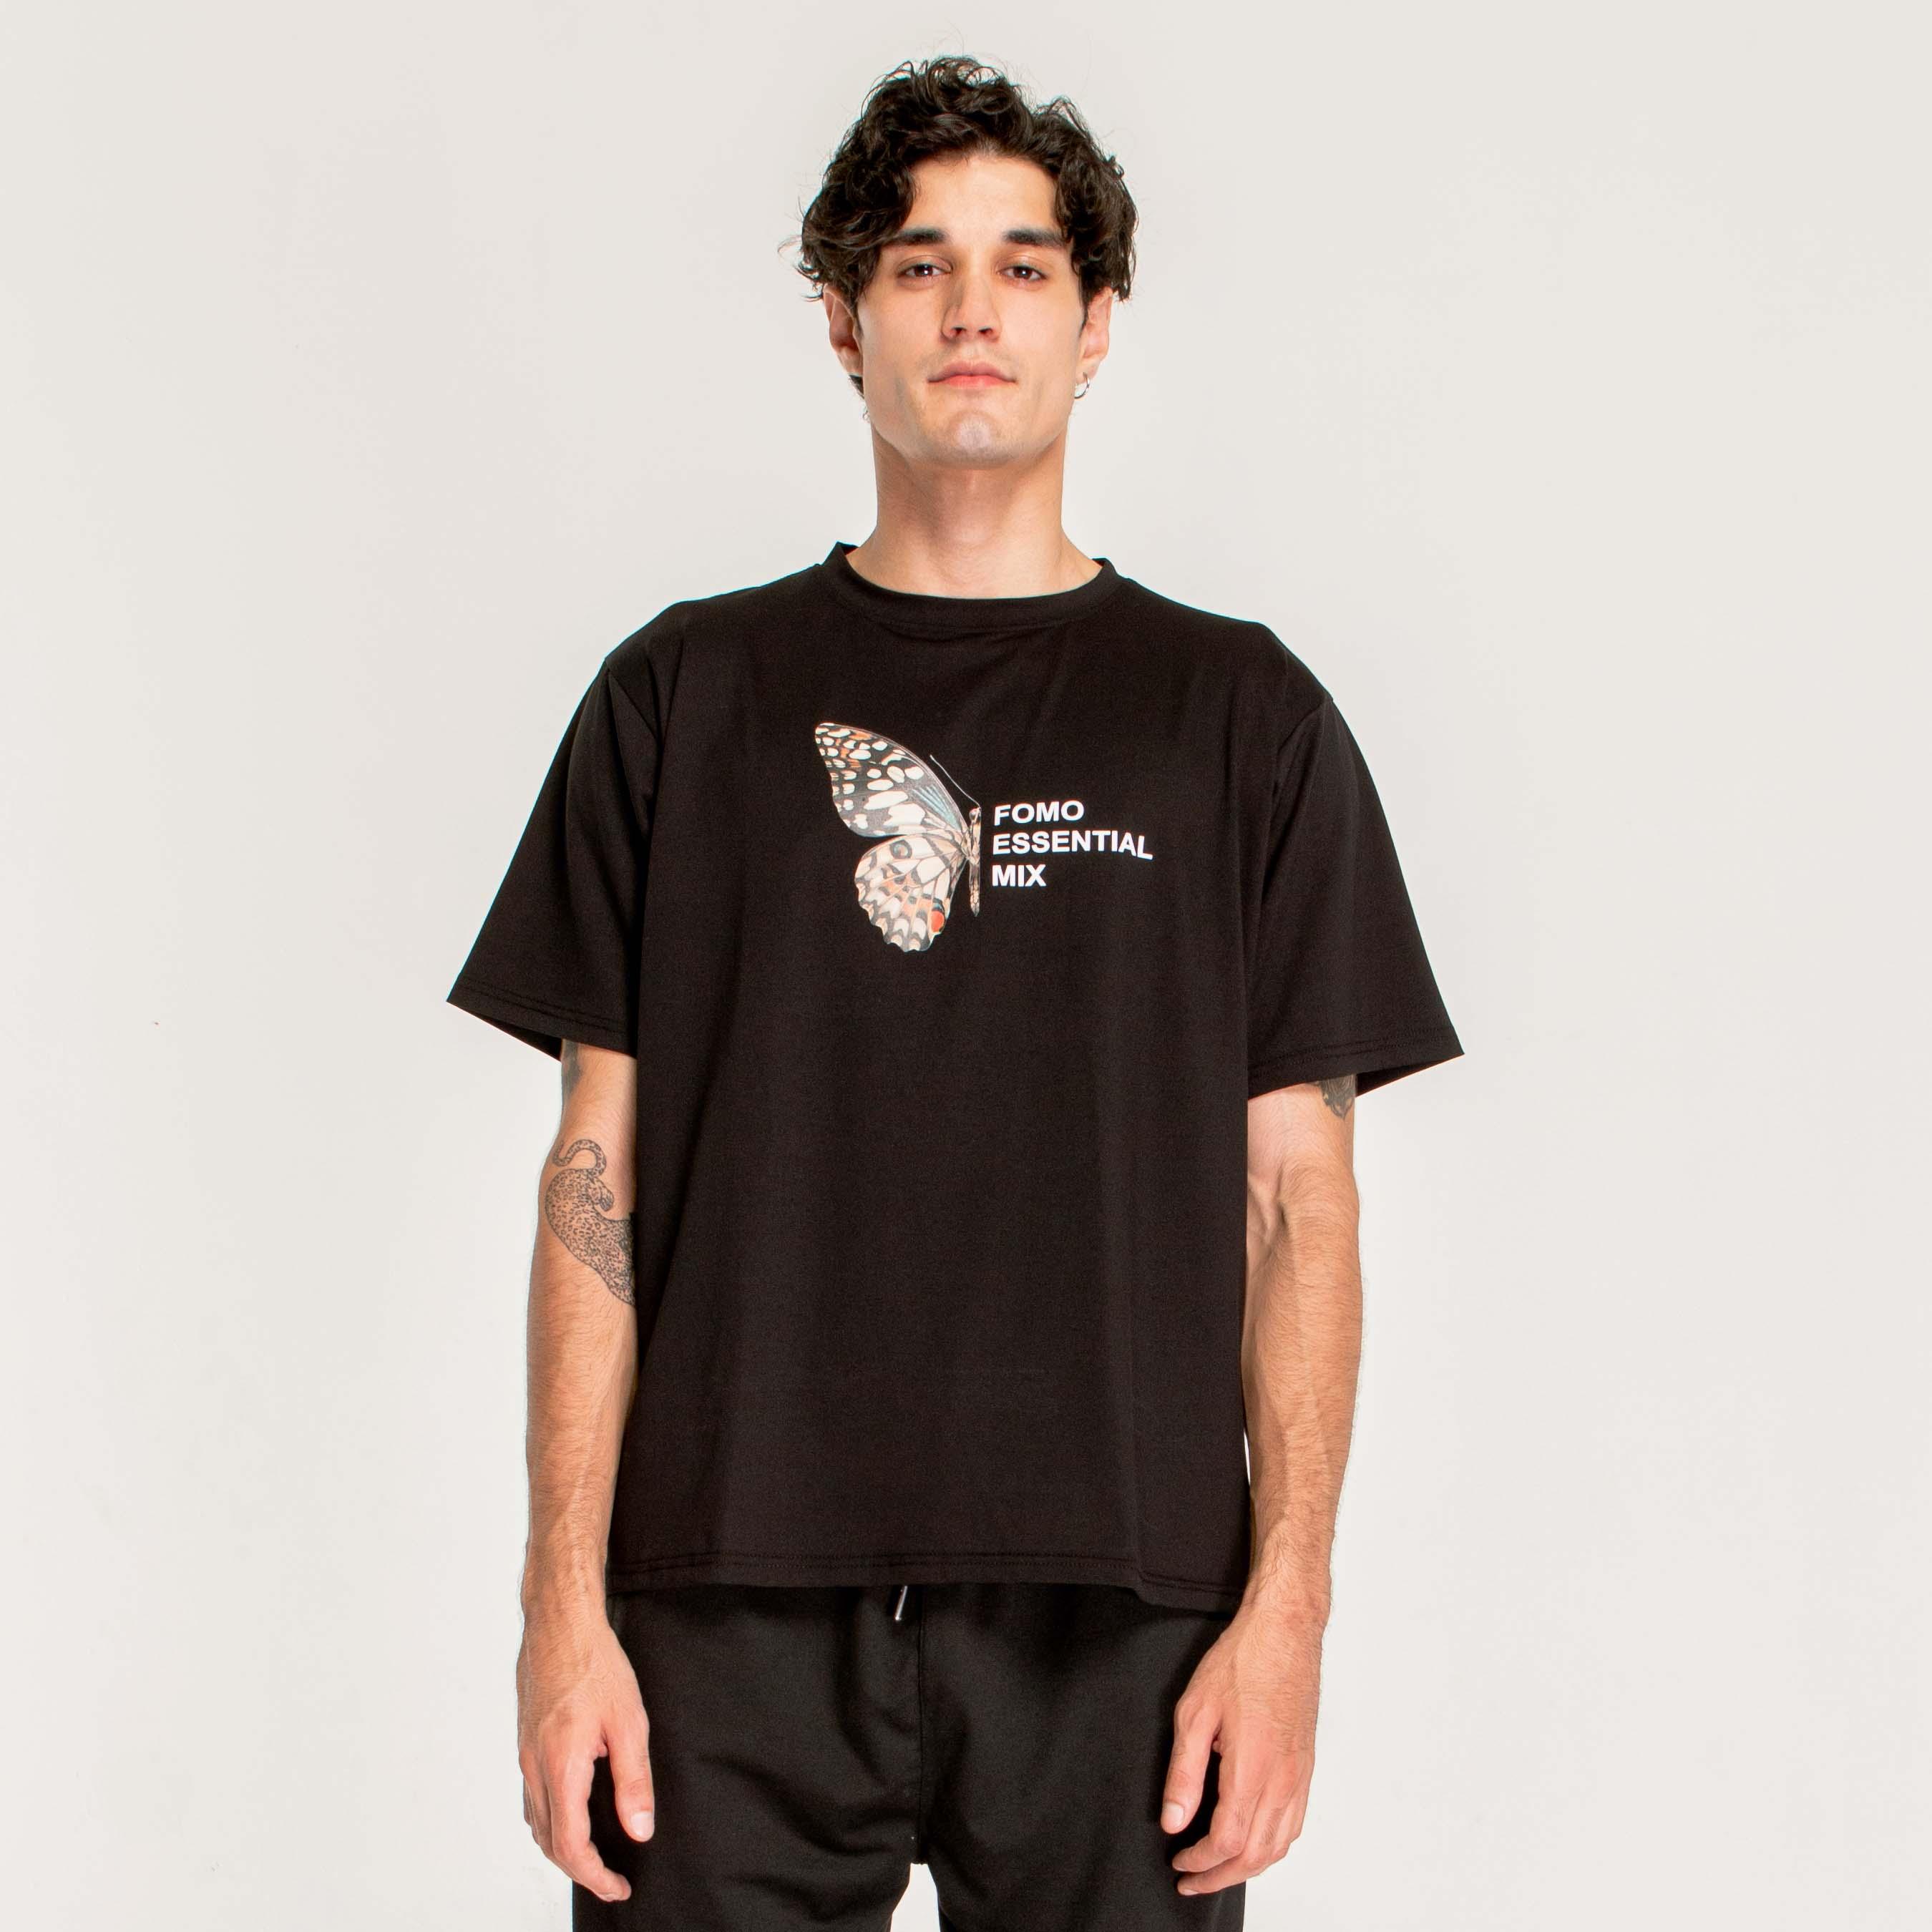 HALFLY T-SHIRT/BLACK